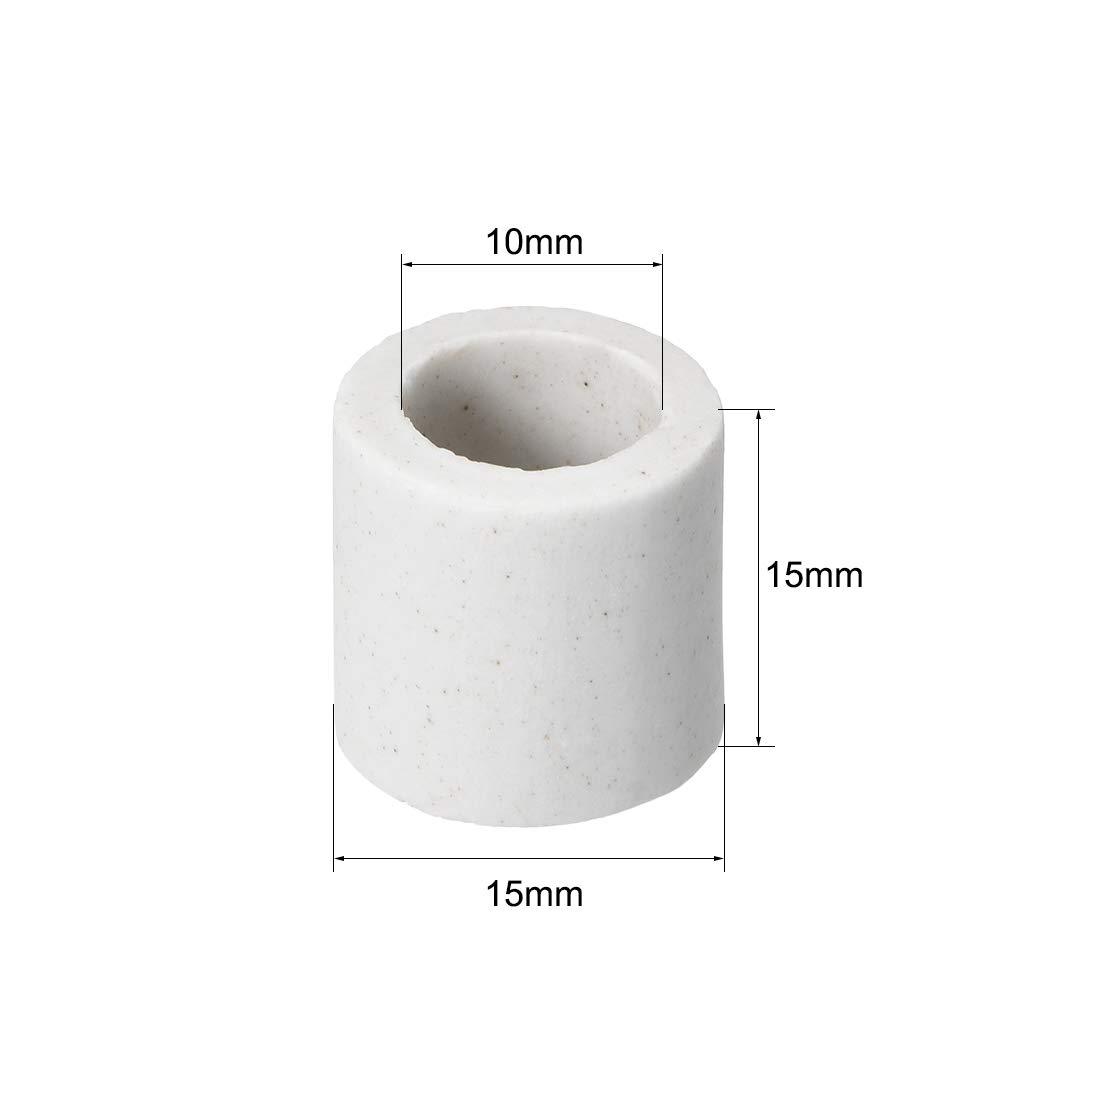 sourcing map Tubo de aislamiento cer/ámico de 10mm de di/ámetro tubo aislador de porcelana de un solo orificio 5 uds